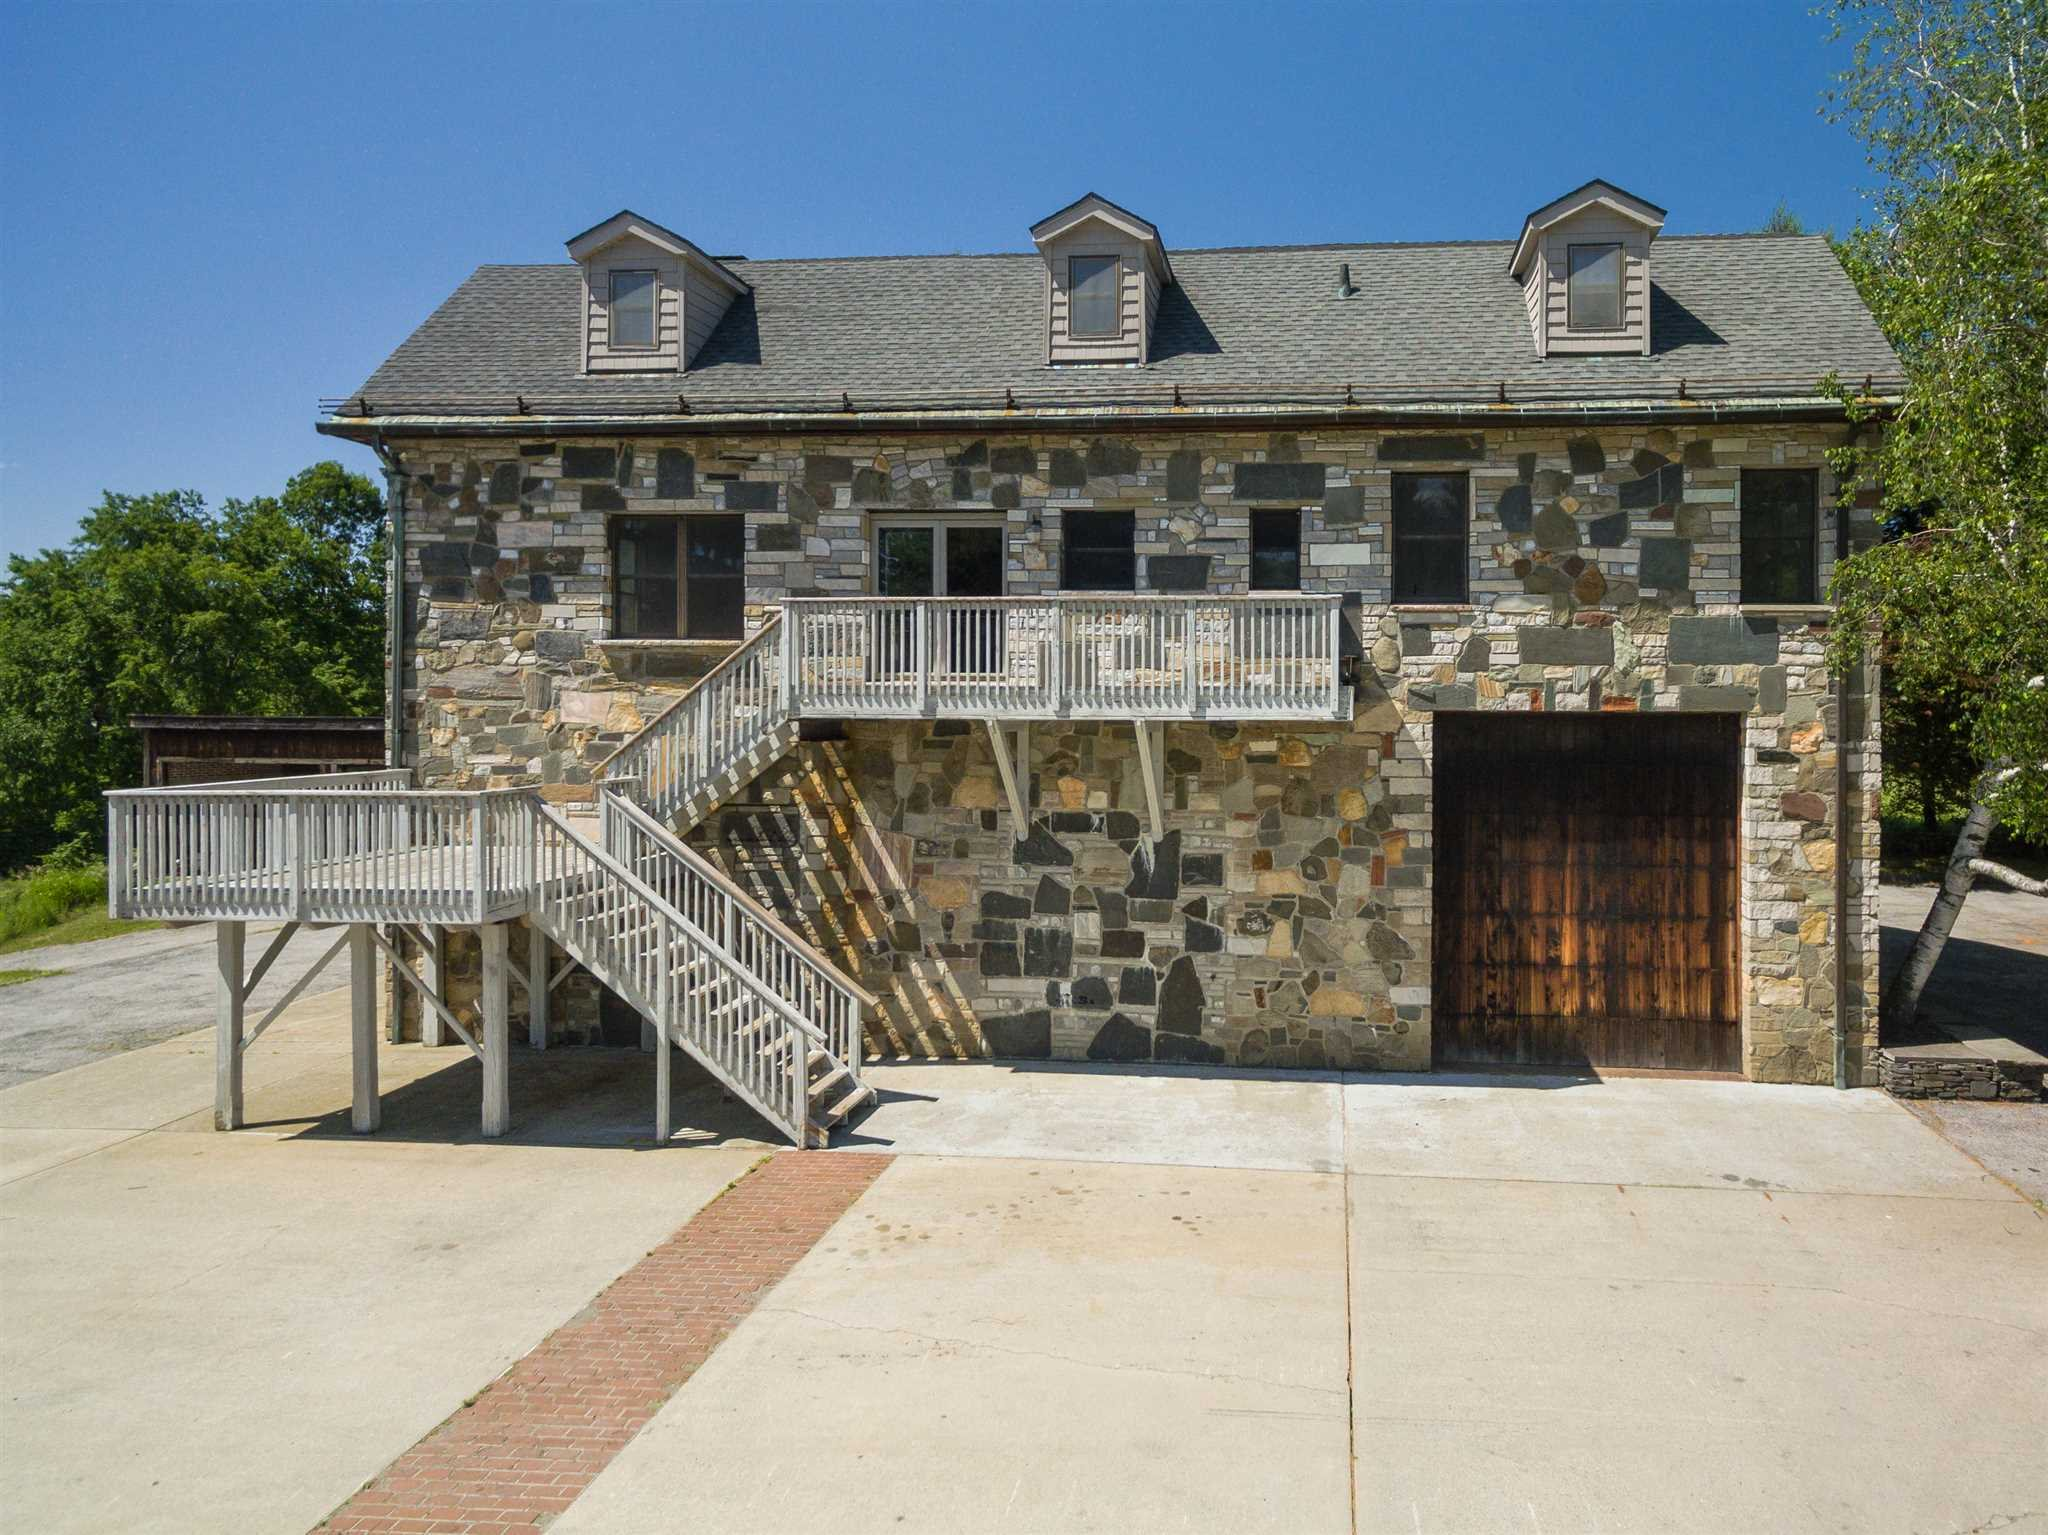 147 TRAVIS RD, Pleasant Valley, NY 12538